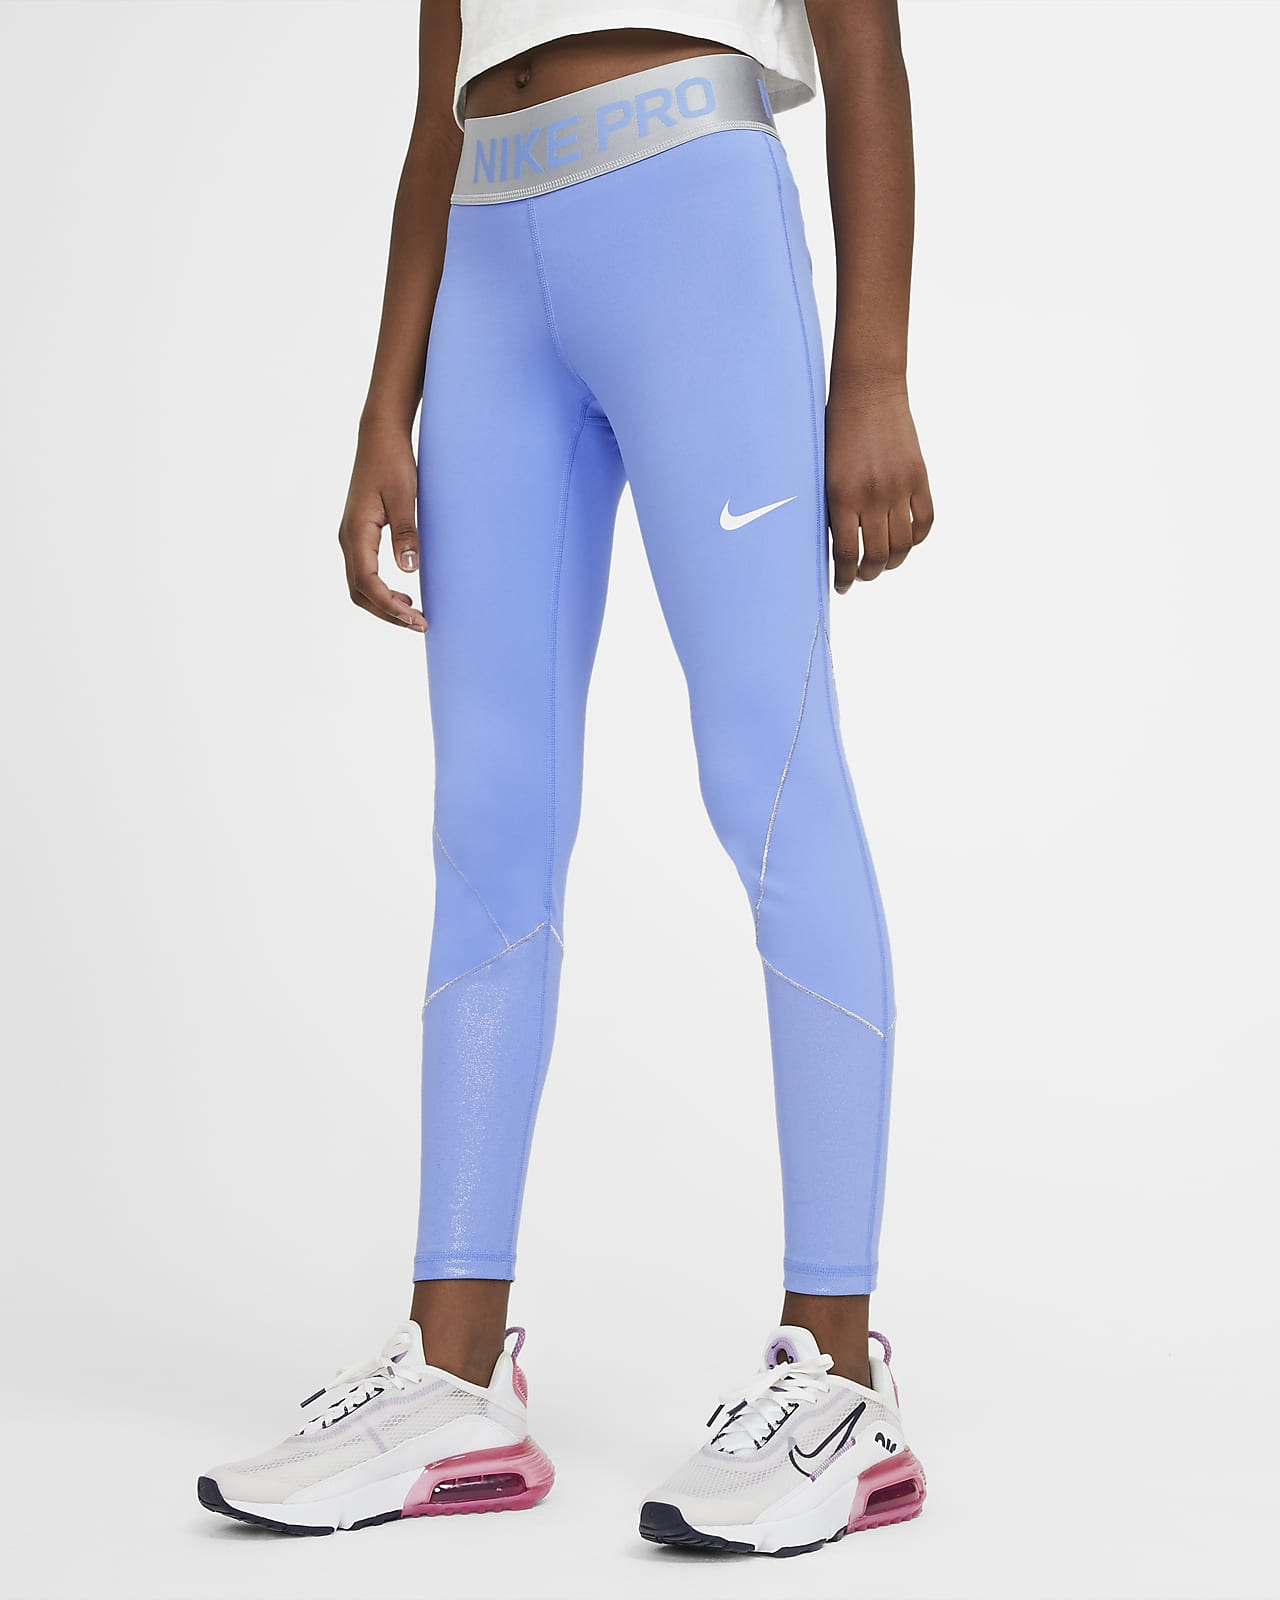 Nike Pro Warm Trainings-Tights für ältere Kinder (Mädchen)